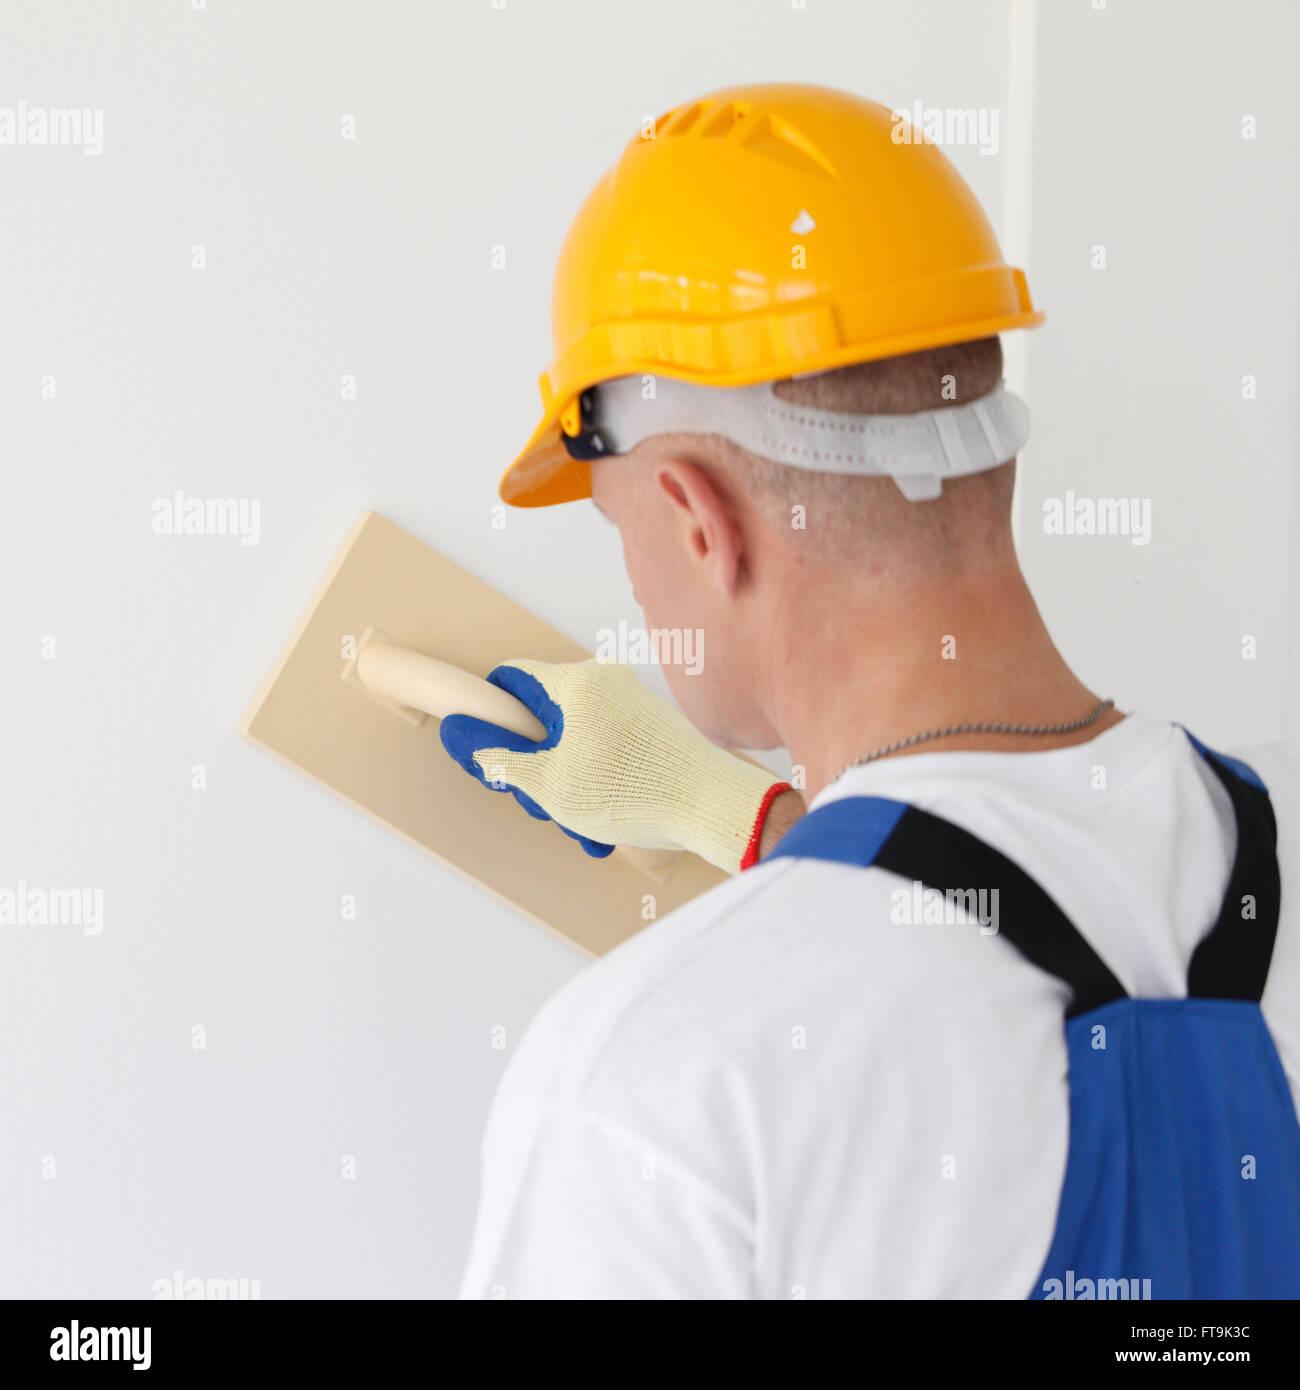 Male plasterer in uniform polishing the wall - Stock Image